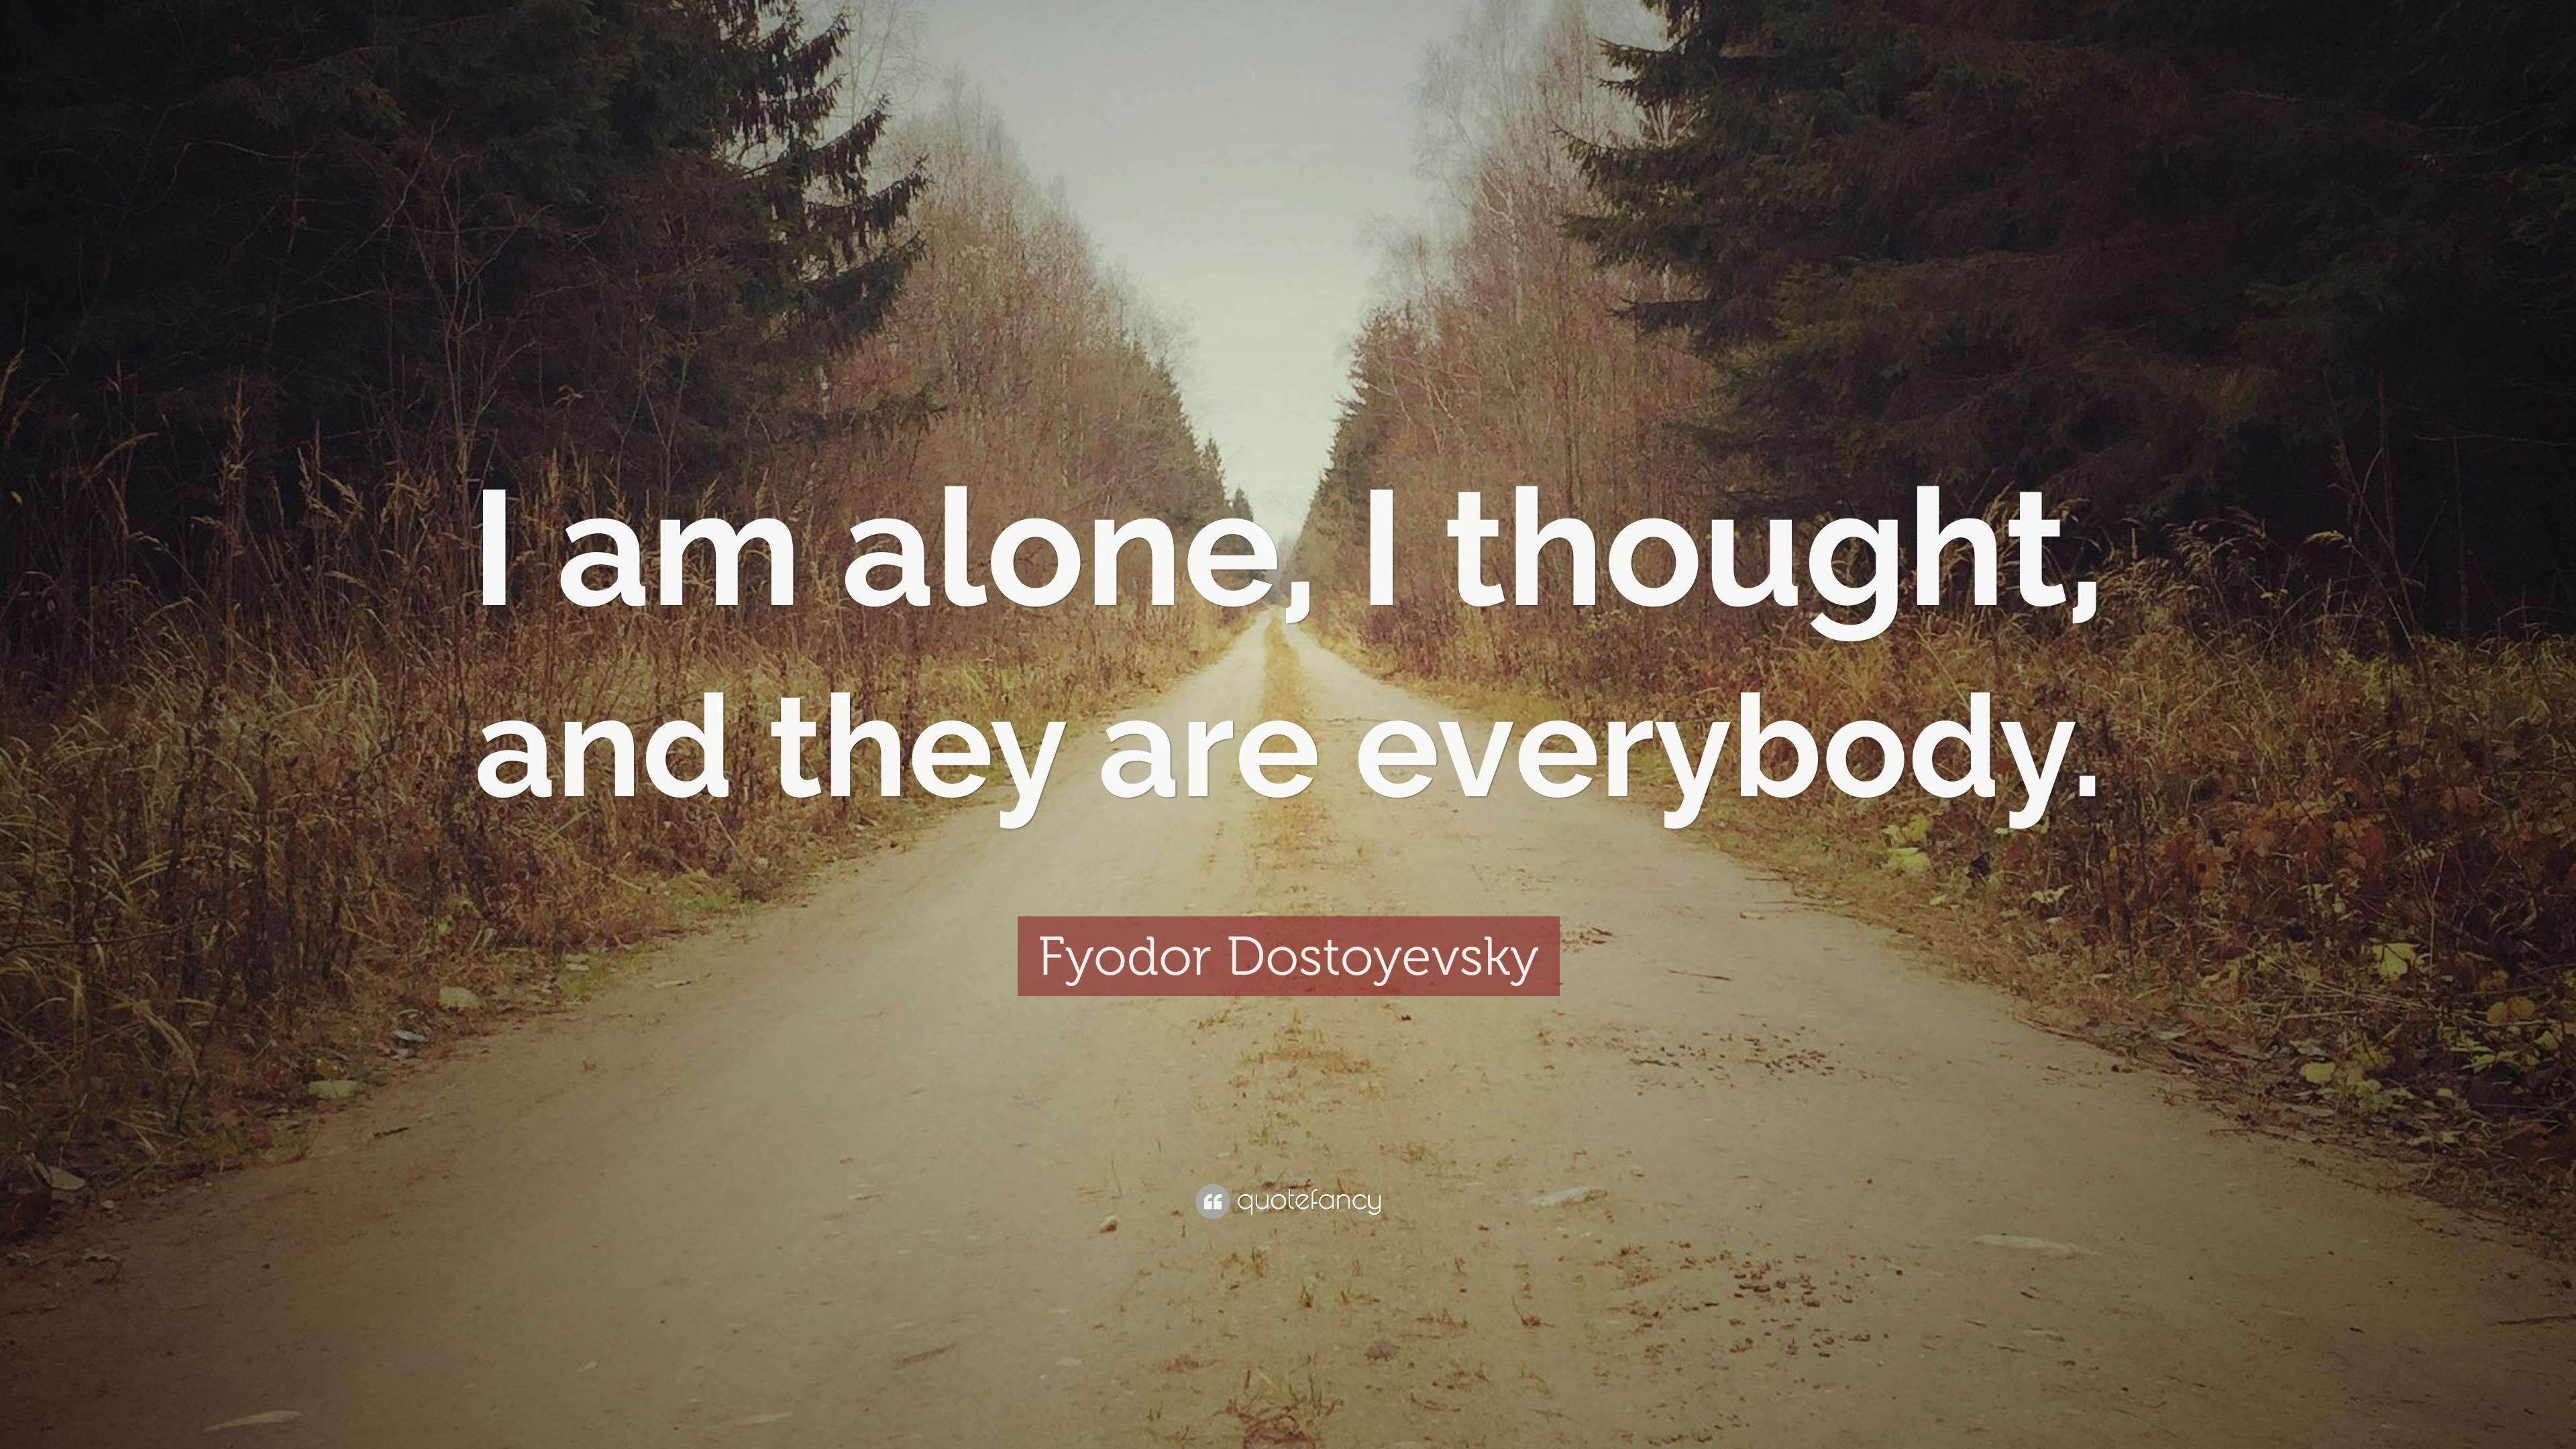 ELSIE: I am alone